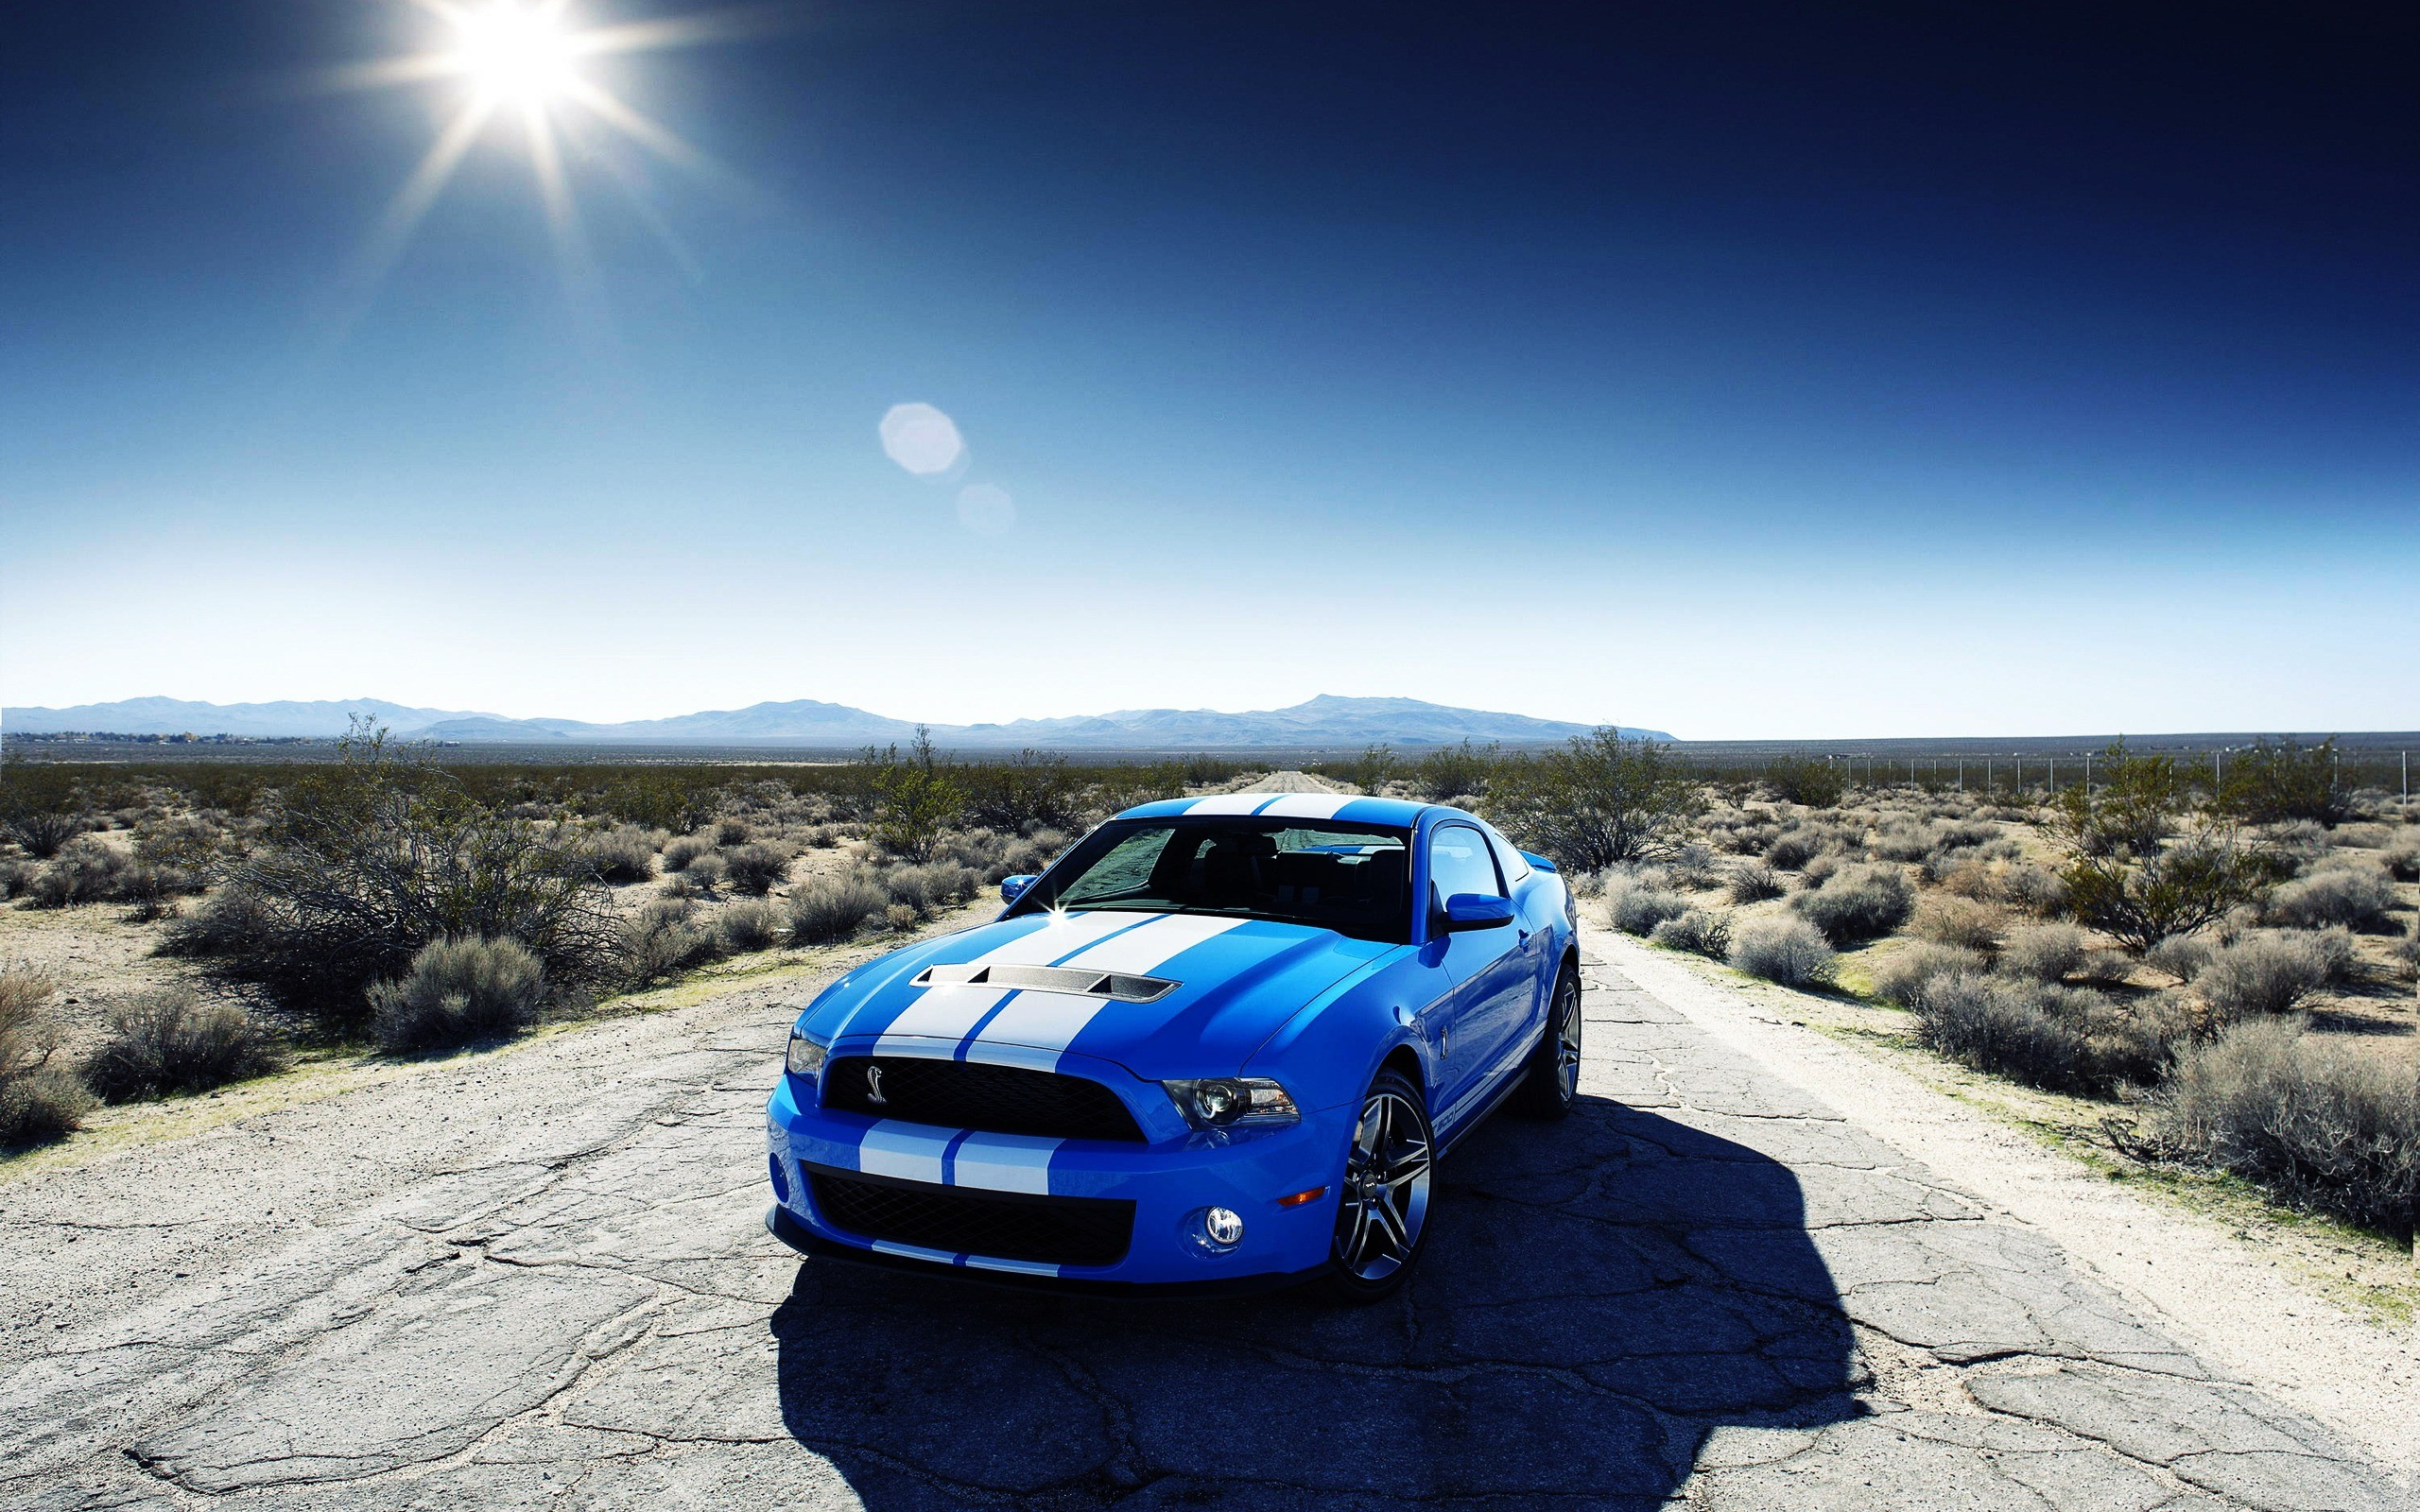 Mustang-Wallpaper-HD-Images